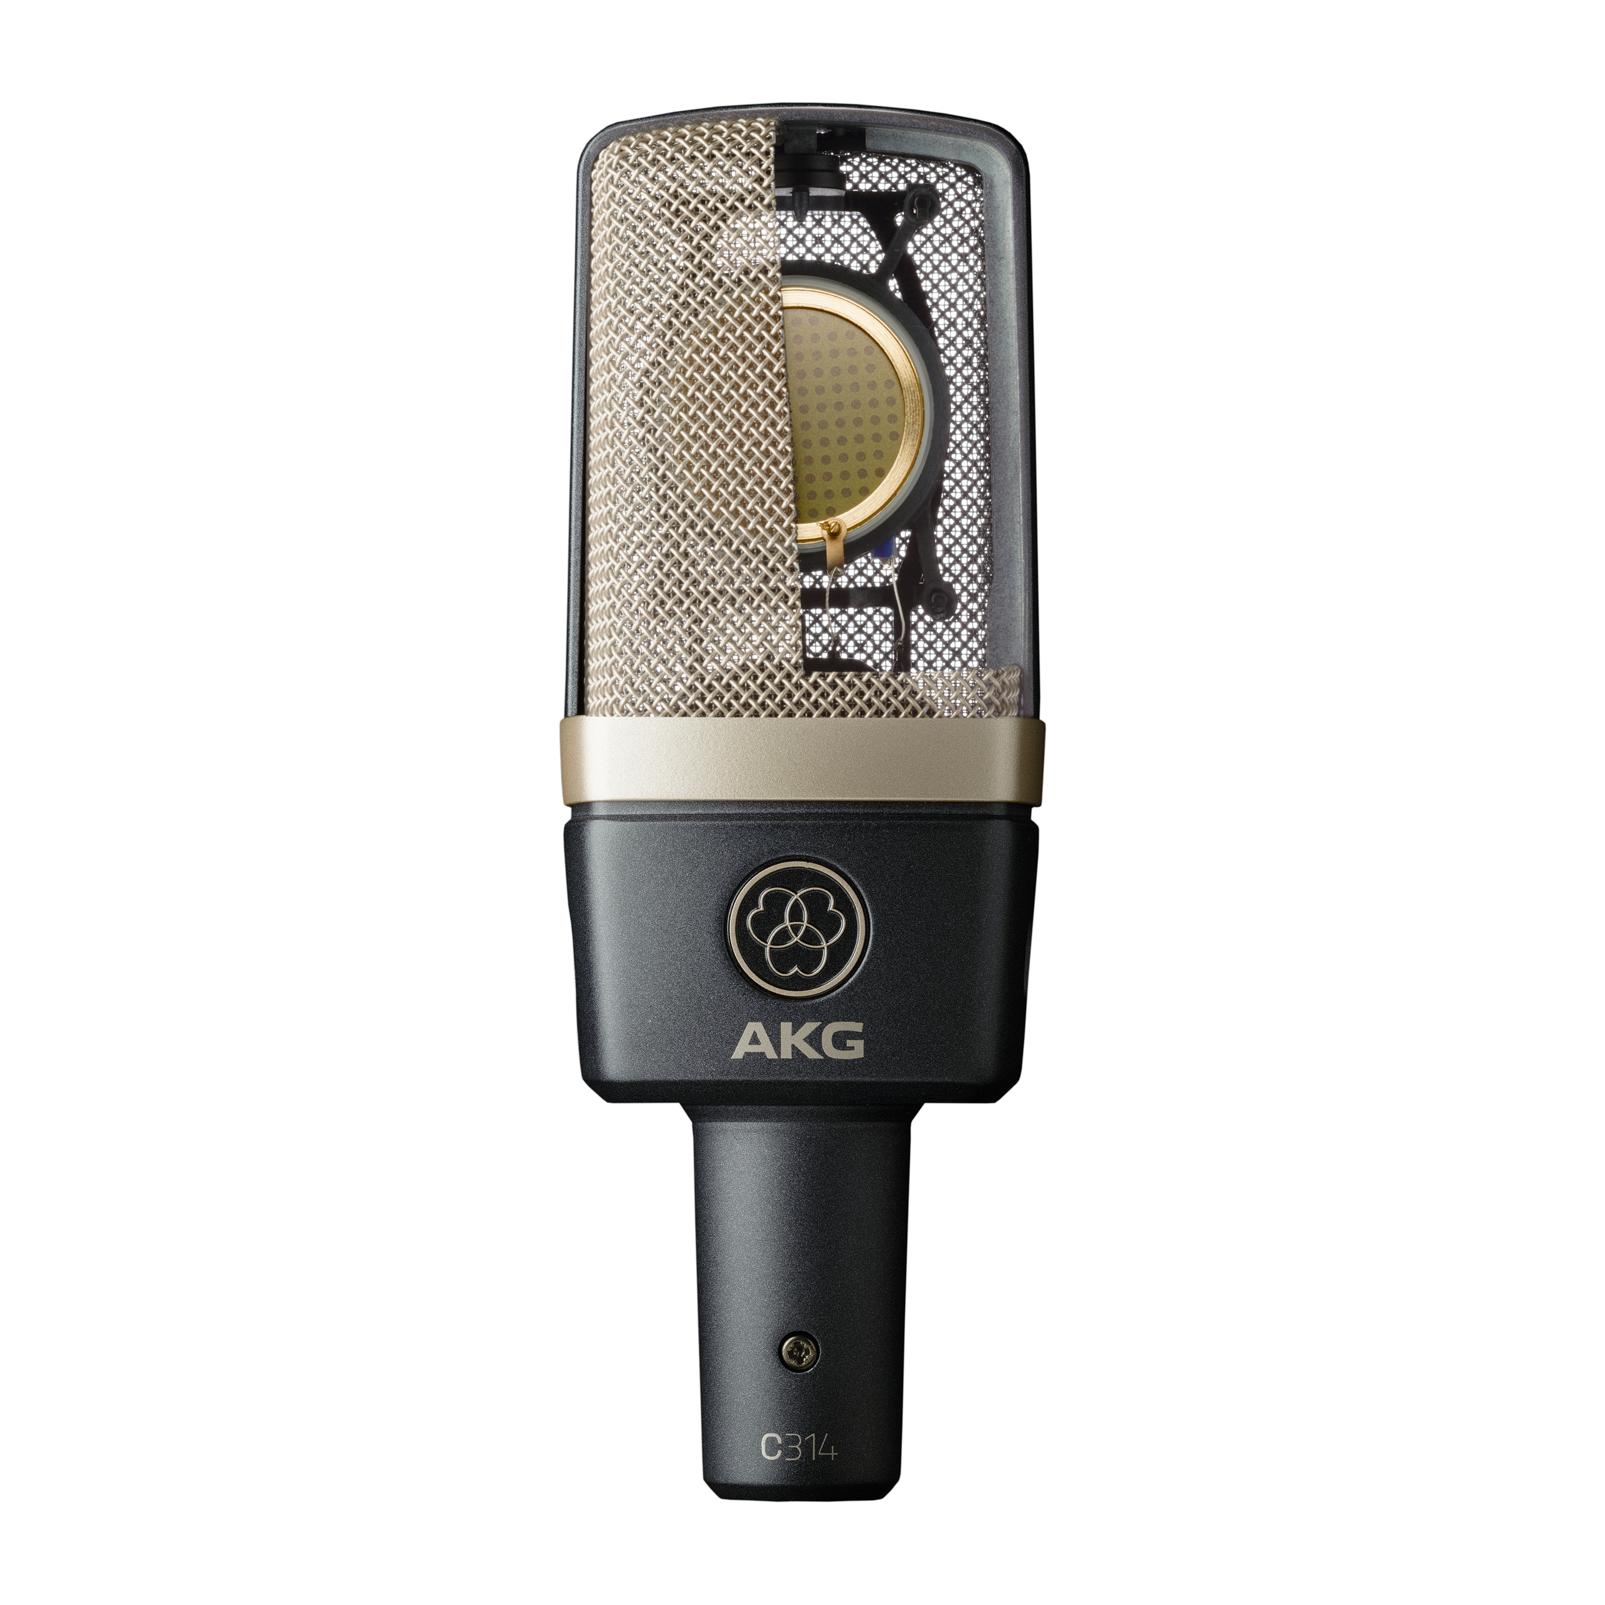 C314 - Black - Professional multi-pattern condenser microphone - Detailshot 1